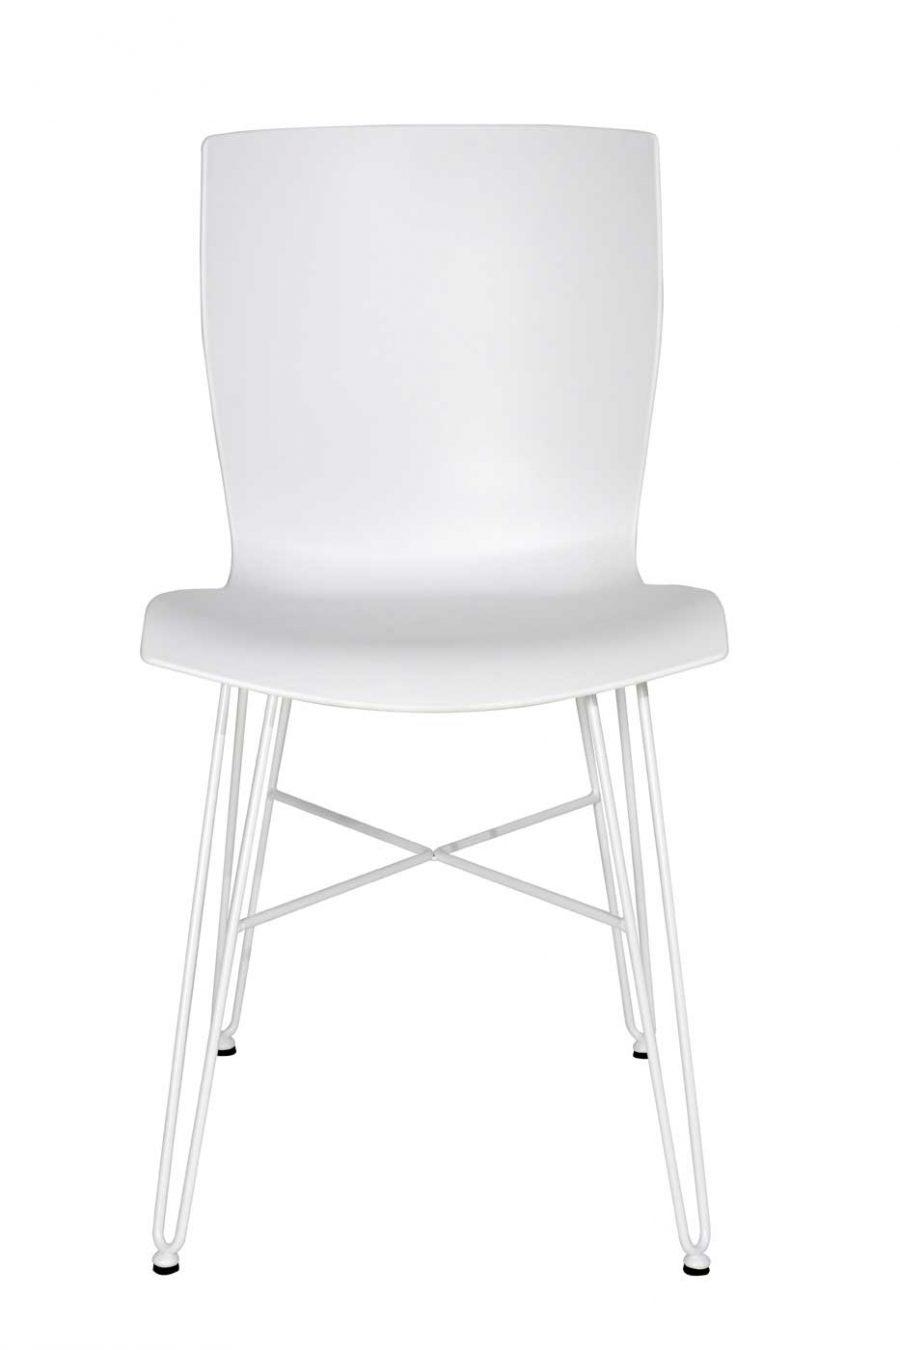 sedia bianca